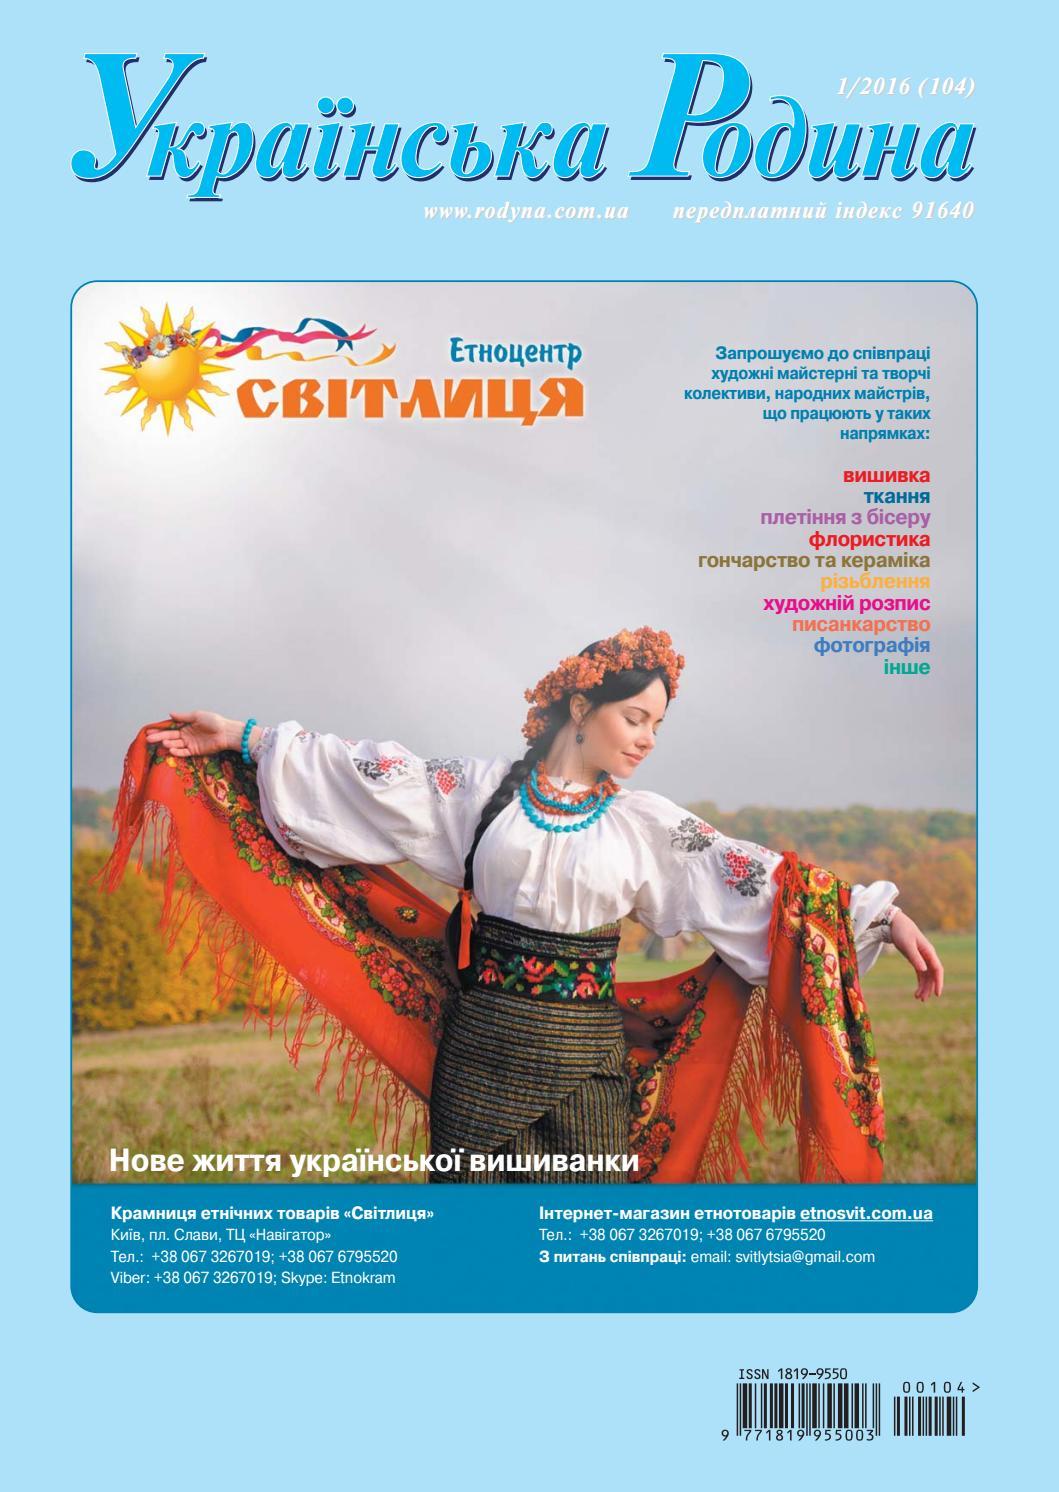 Журнал Українська Родина № 1 2016 р. by Siryj Vovk - issuu 37a7a87132d38